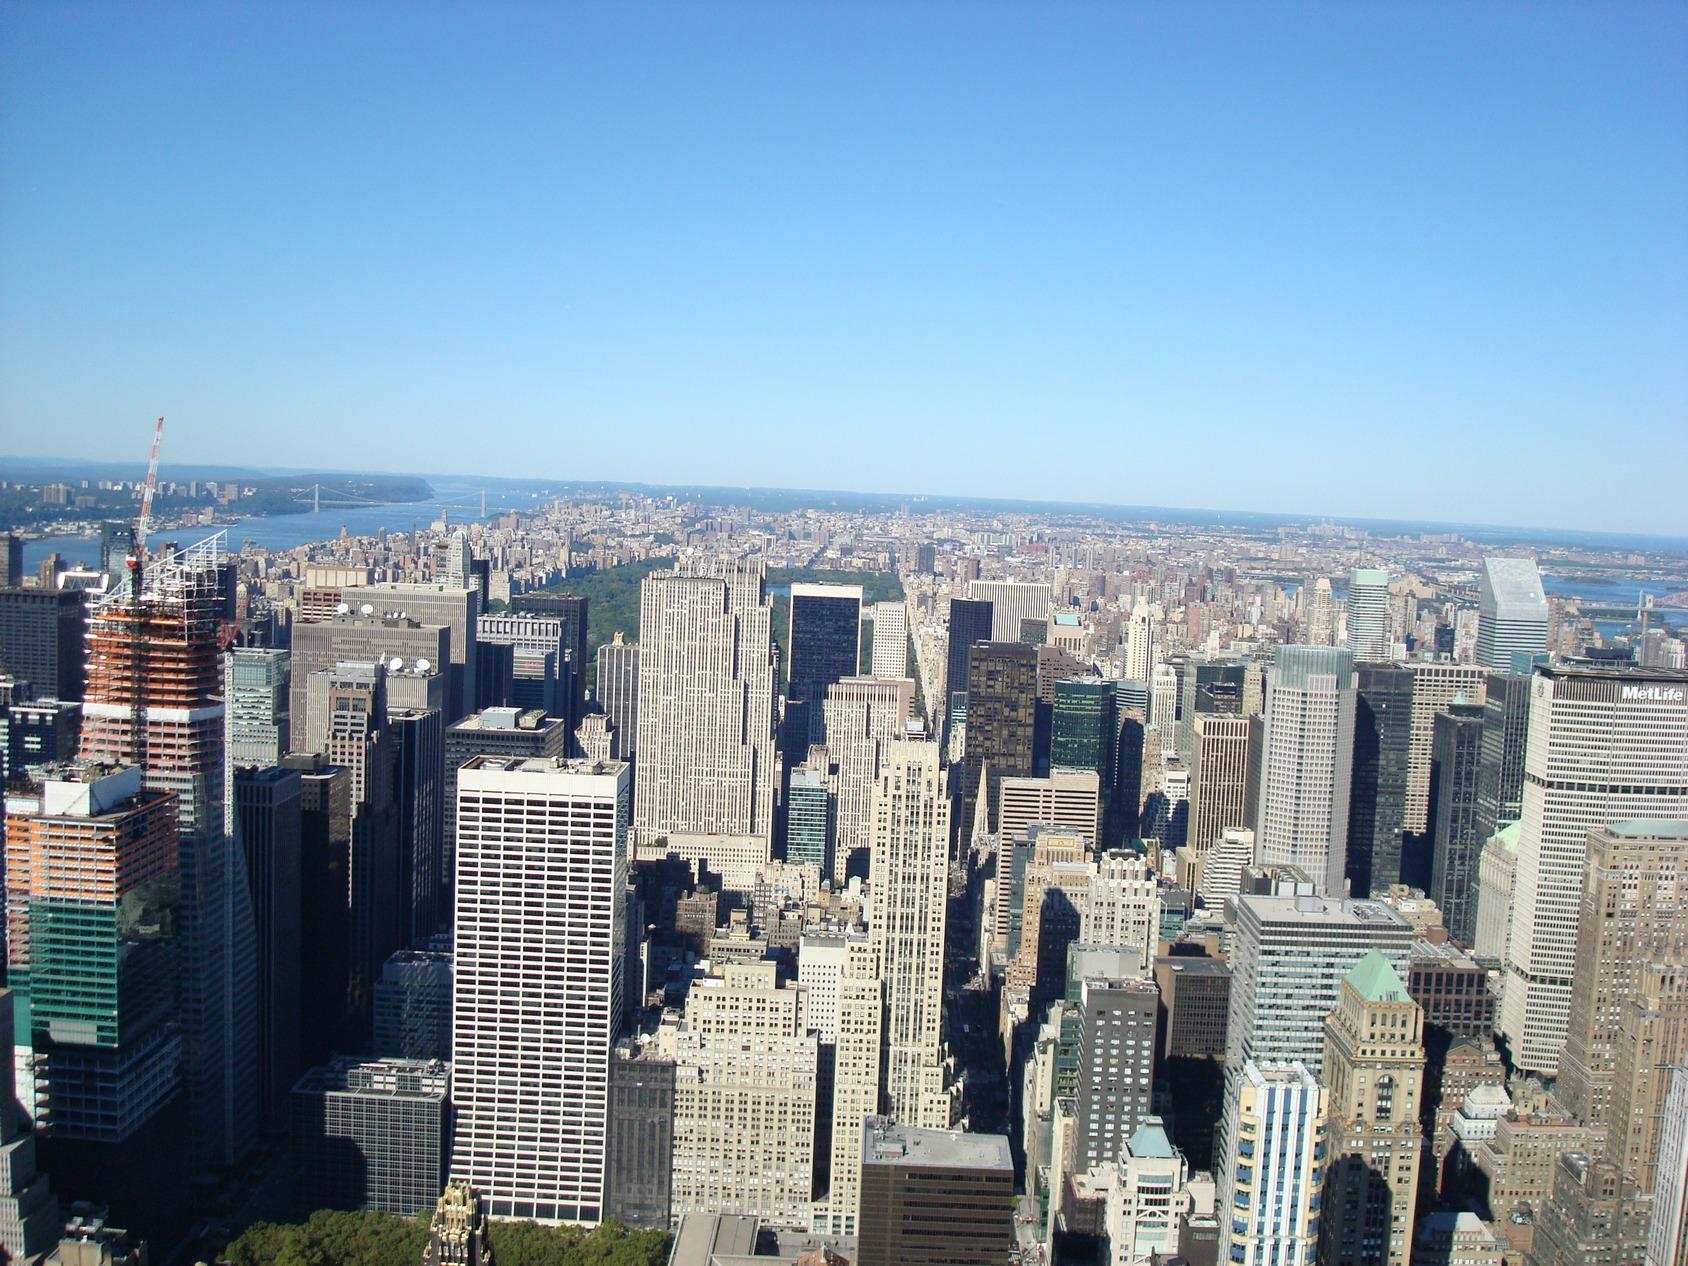 New York City_EmpireStateBuildingObservatory_ViewofCentralPark_UpperManhattan